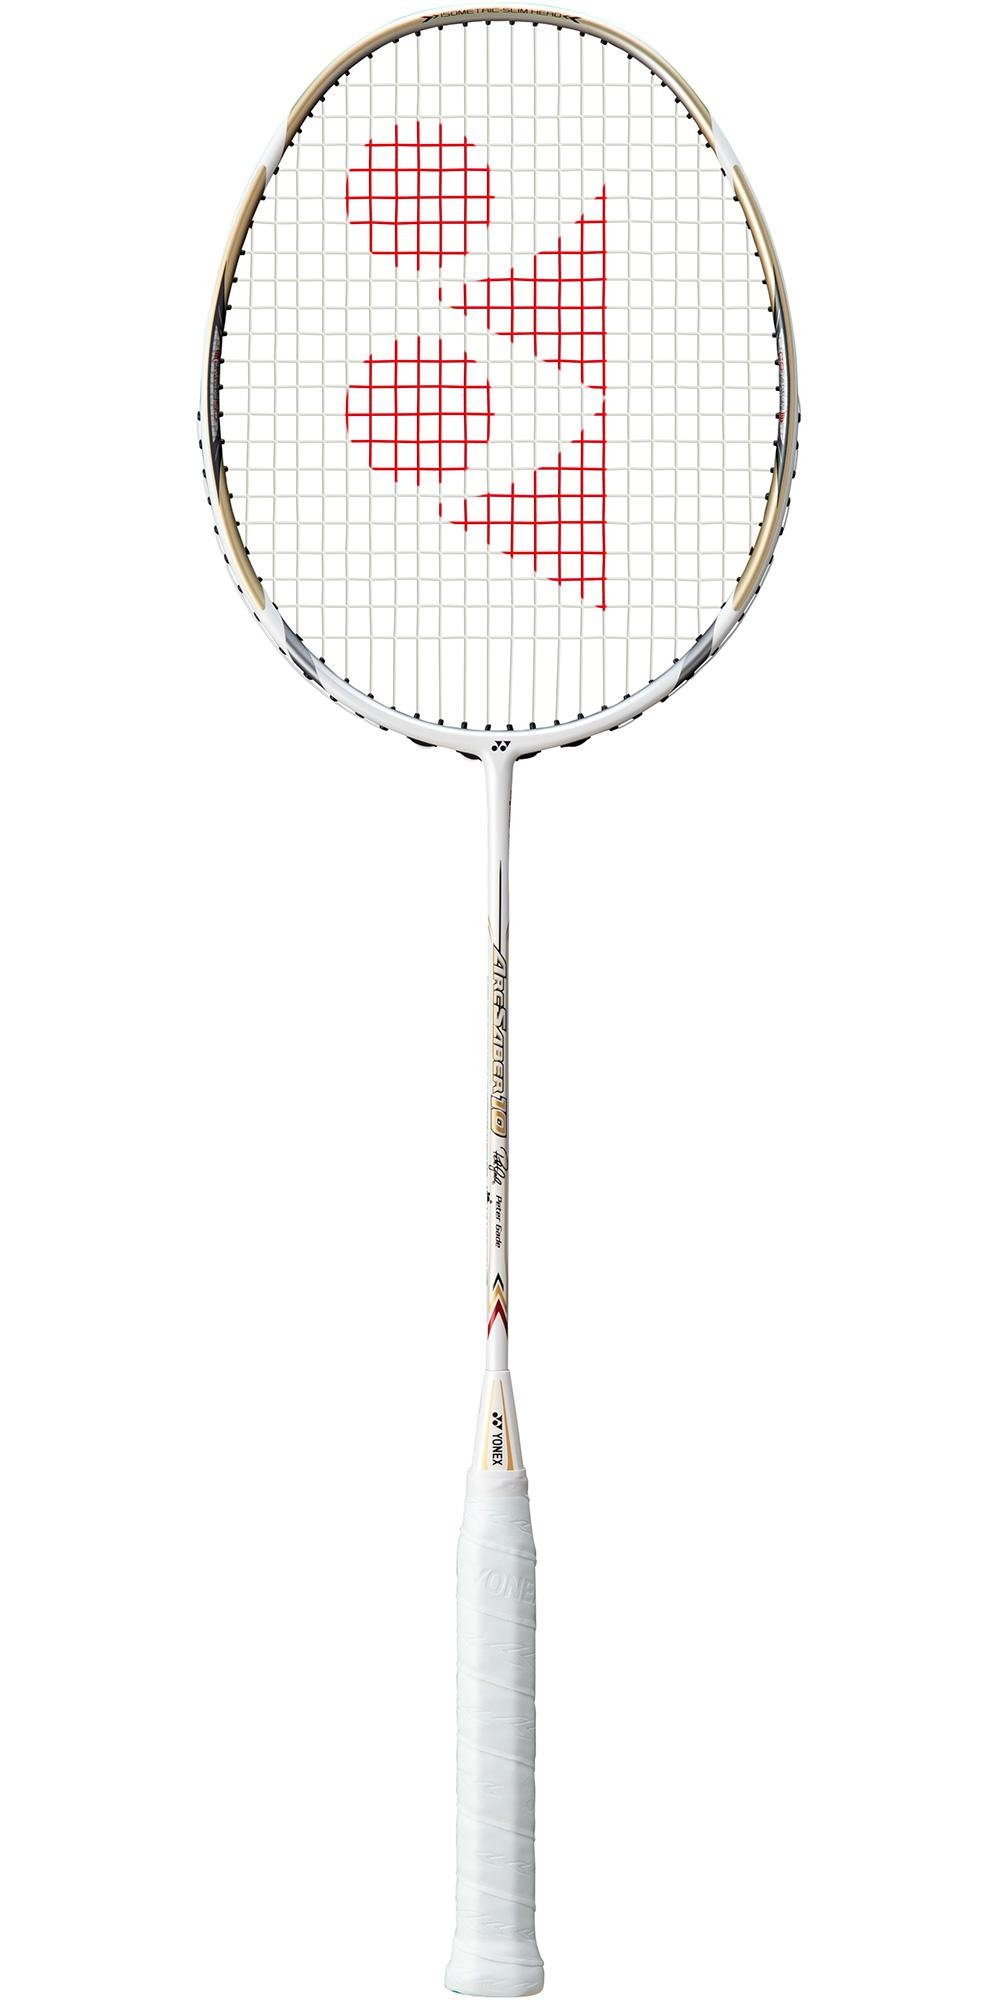 Yonex Arcsaber 10 White 2018 New Badminton Racket (Strung with NG99 @ 24lb)